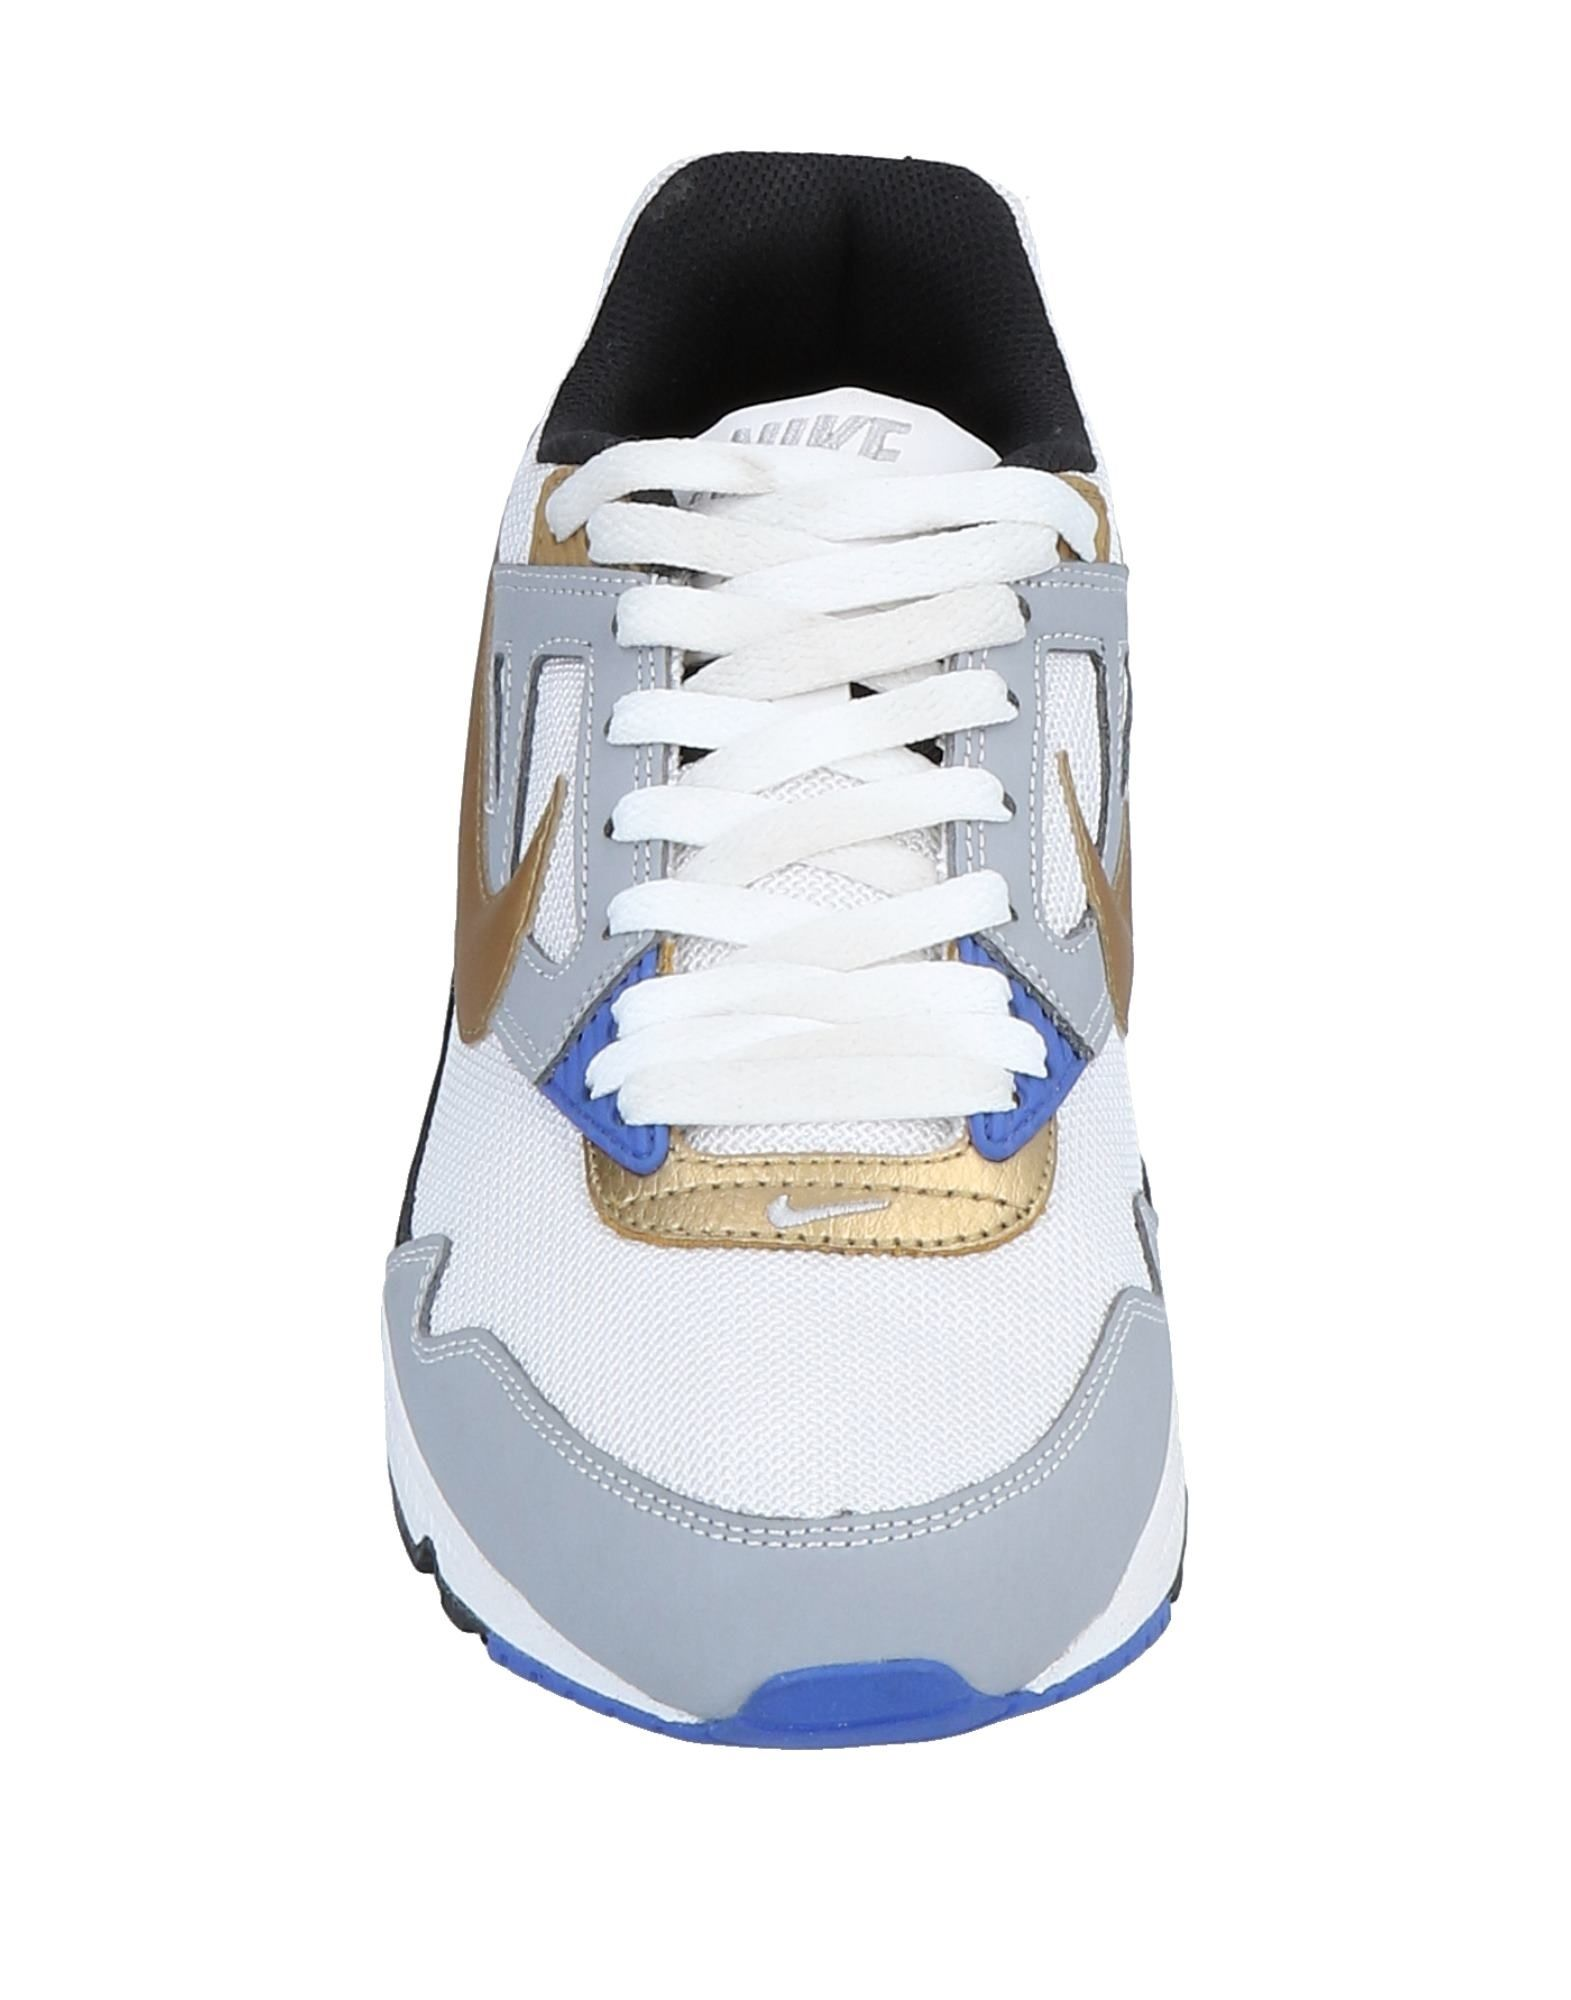 Rabatt echte Sneakers Schuhe Nike Sneakers echte Herren  11572912ED a4529f